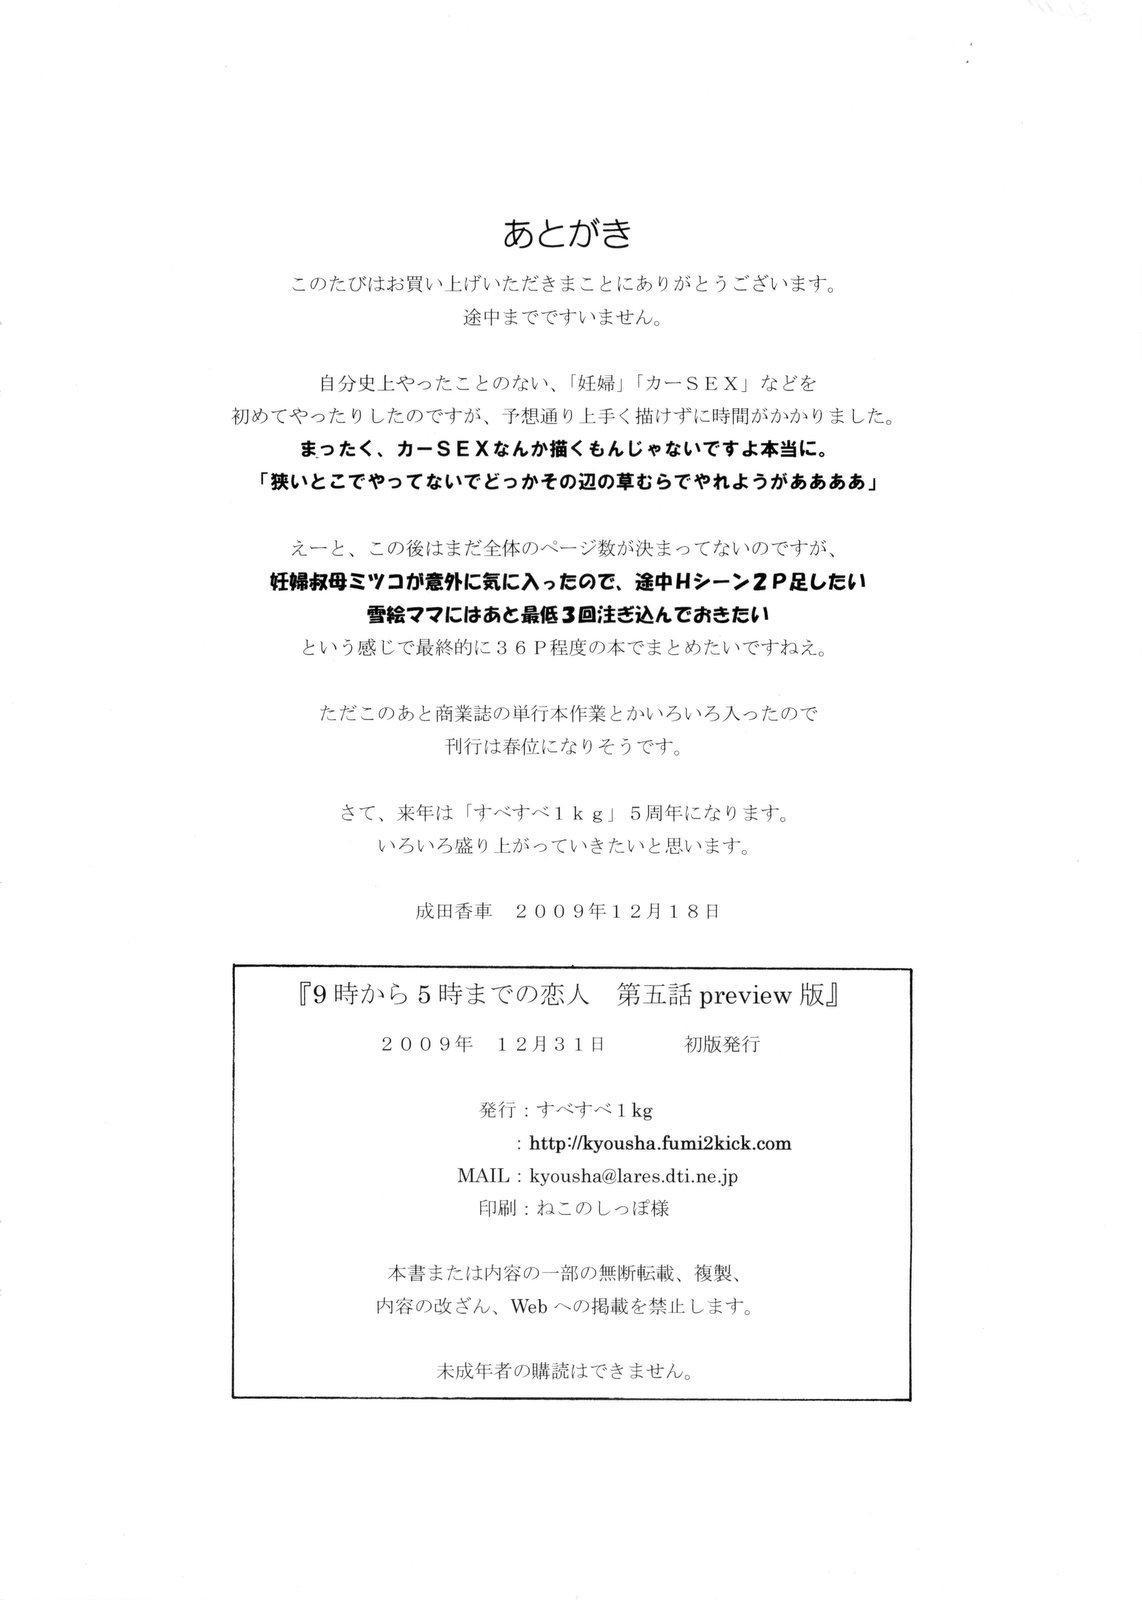 NINE to FIVE LOVER dai 5 wa Preview ban 19